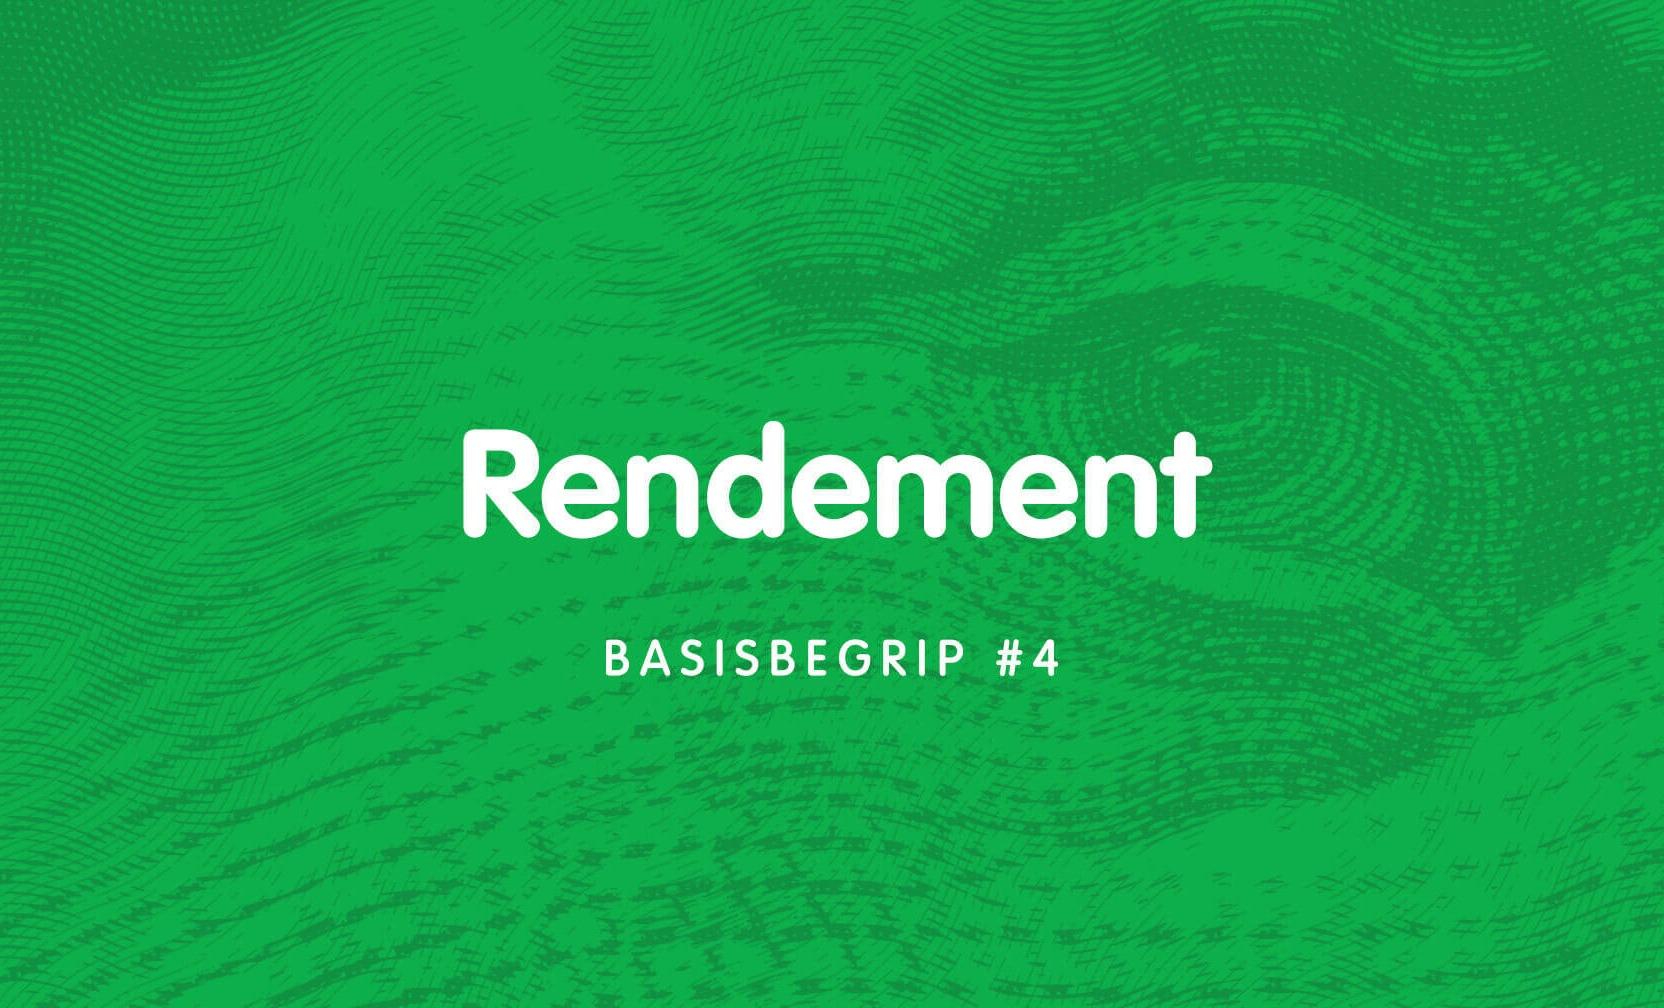 Basisbegrip #4: Rendement